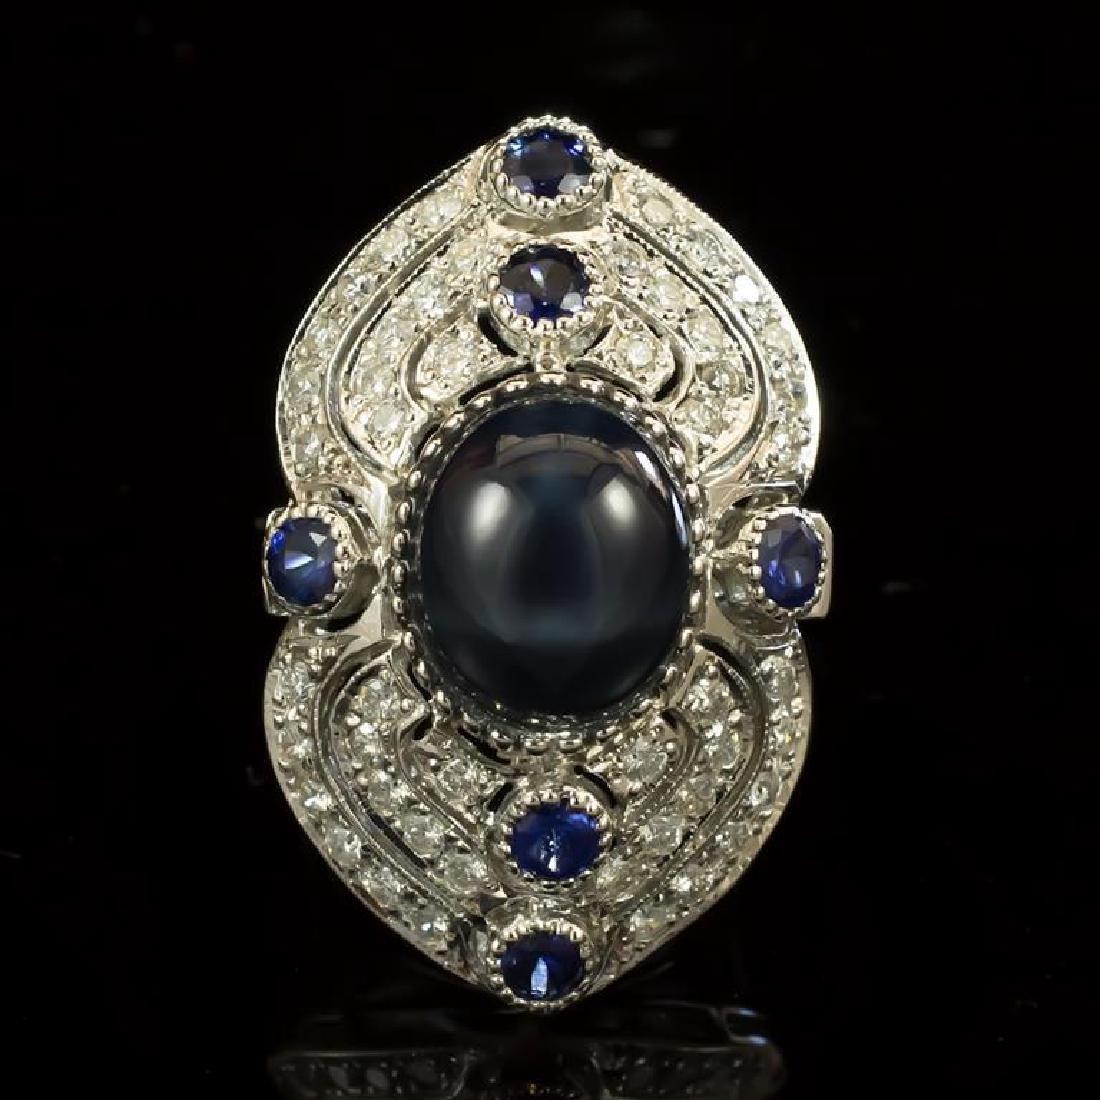 14K Gold 12.60ct Star Sapphire, 0.55ct Sapphire  1.41ct